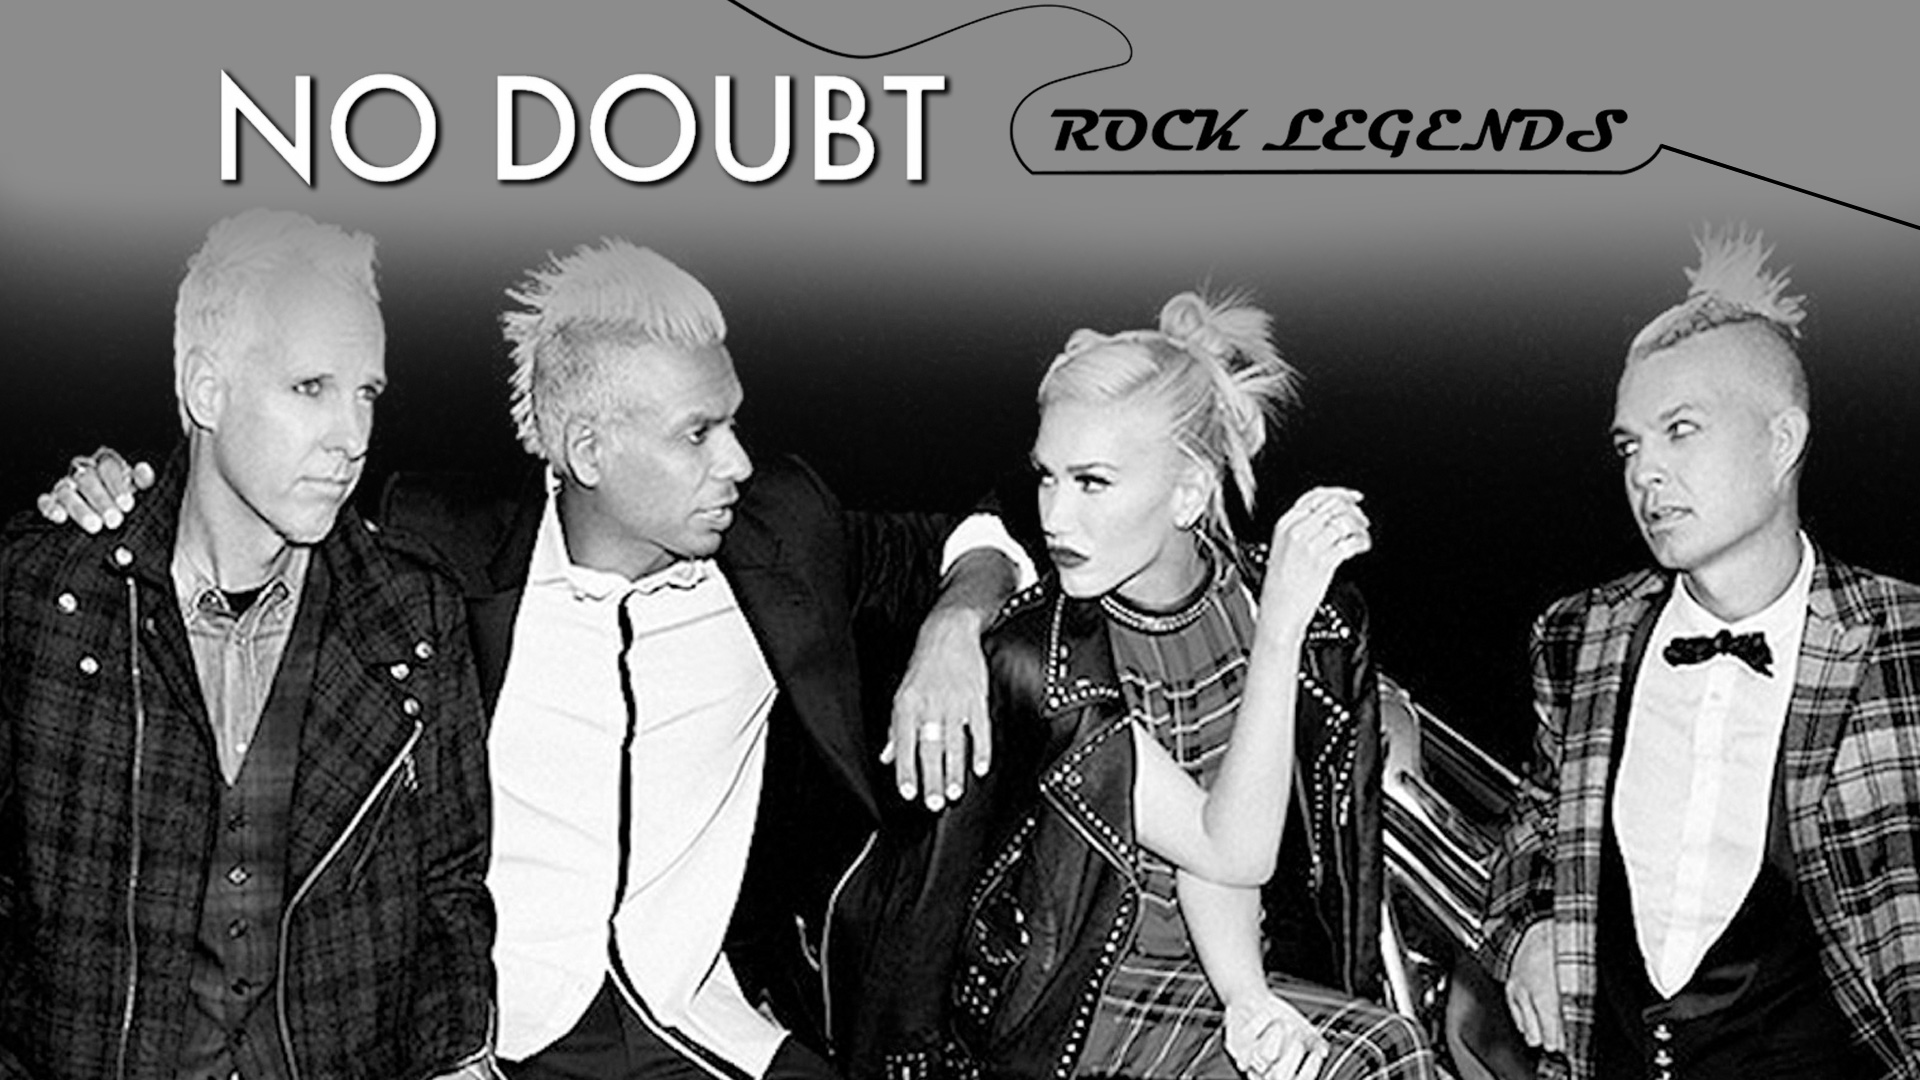 No Doubt - Rock Legends